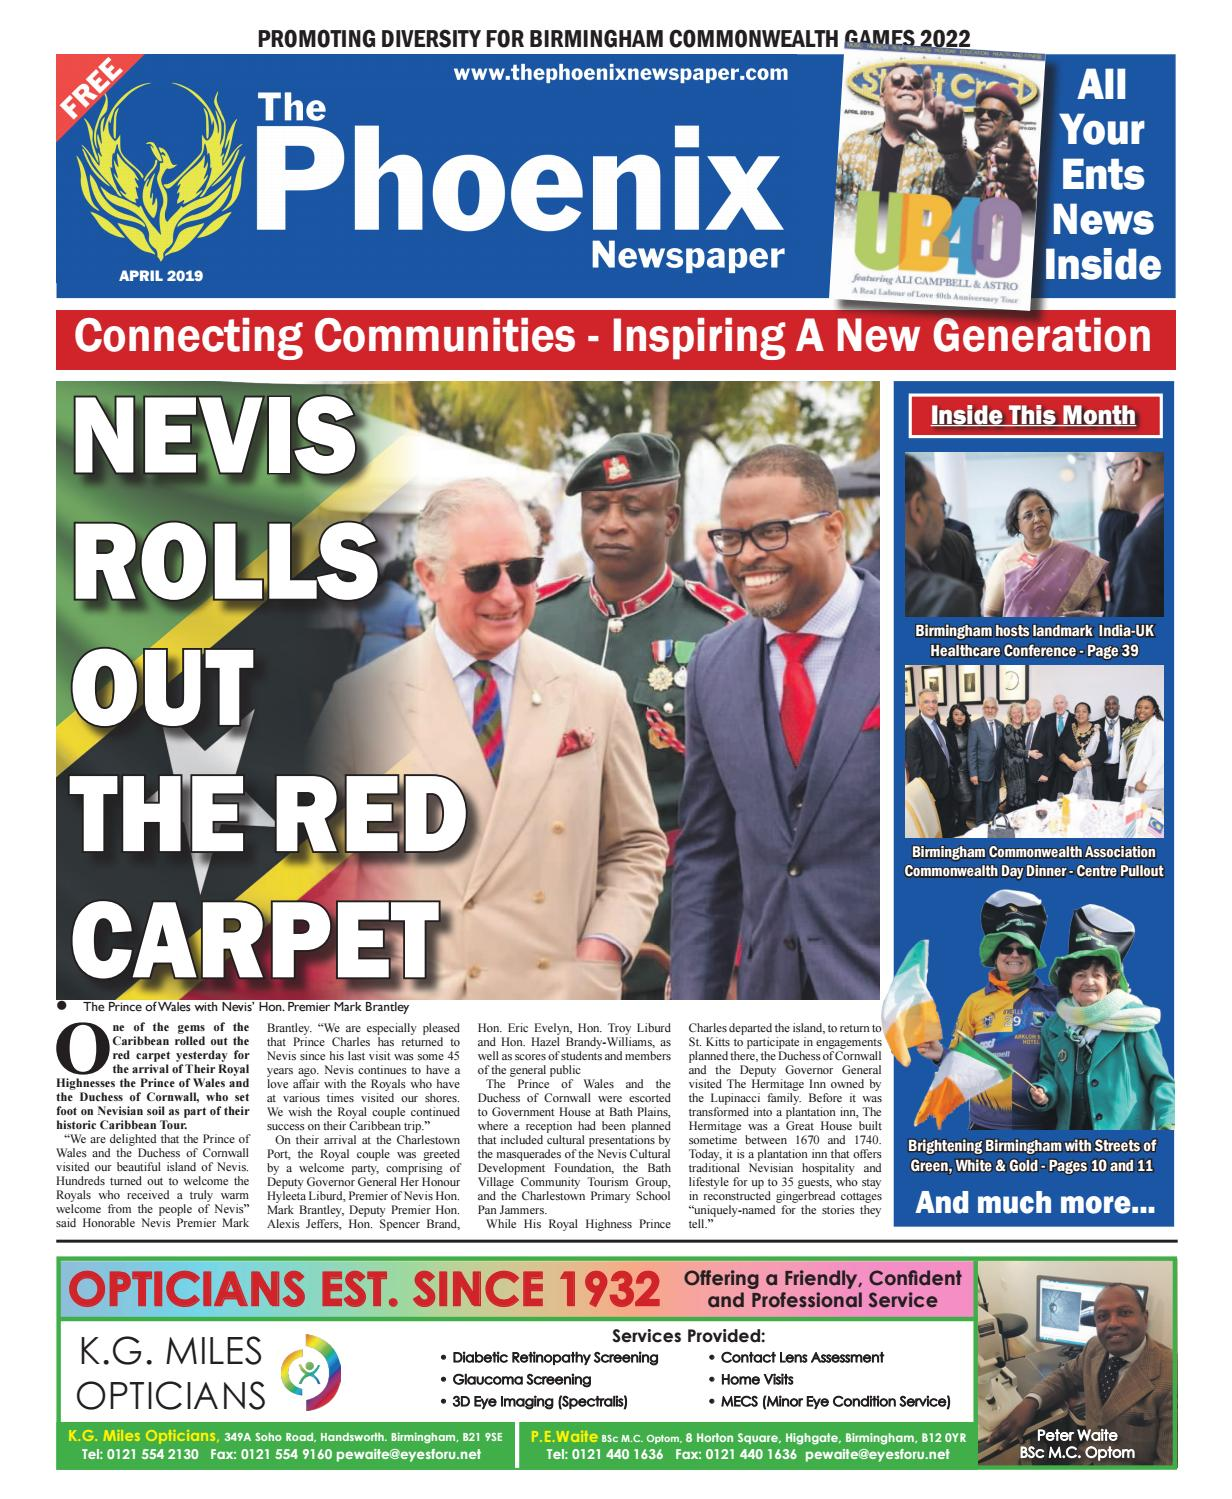 The Phoenix Newspaper - April 2019 by The Phoenix Newspaper - issuu